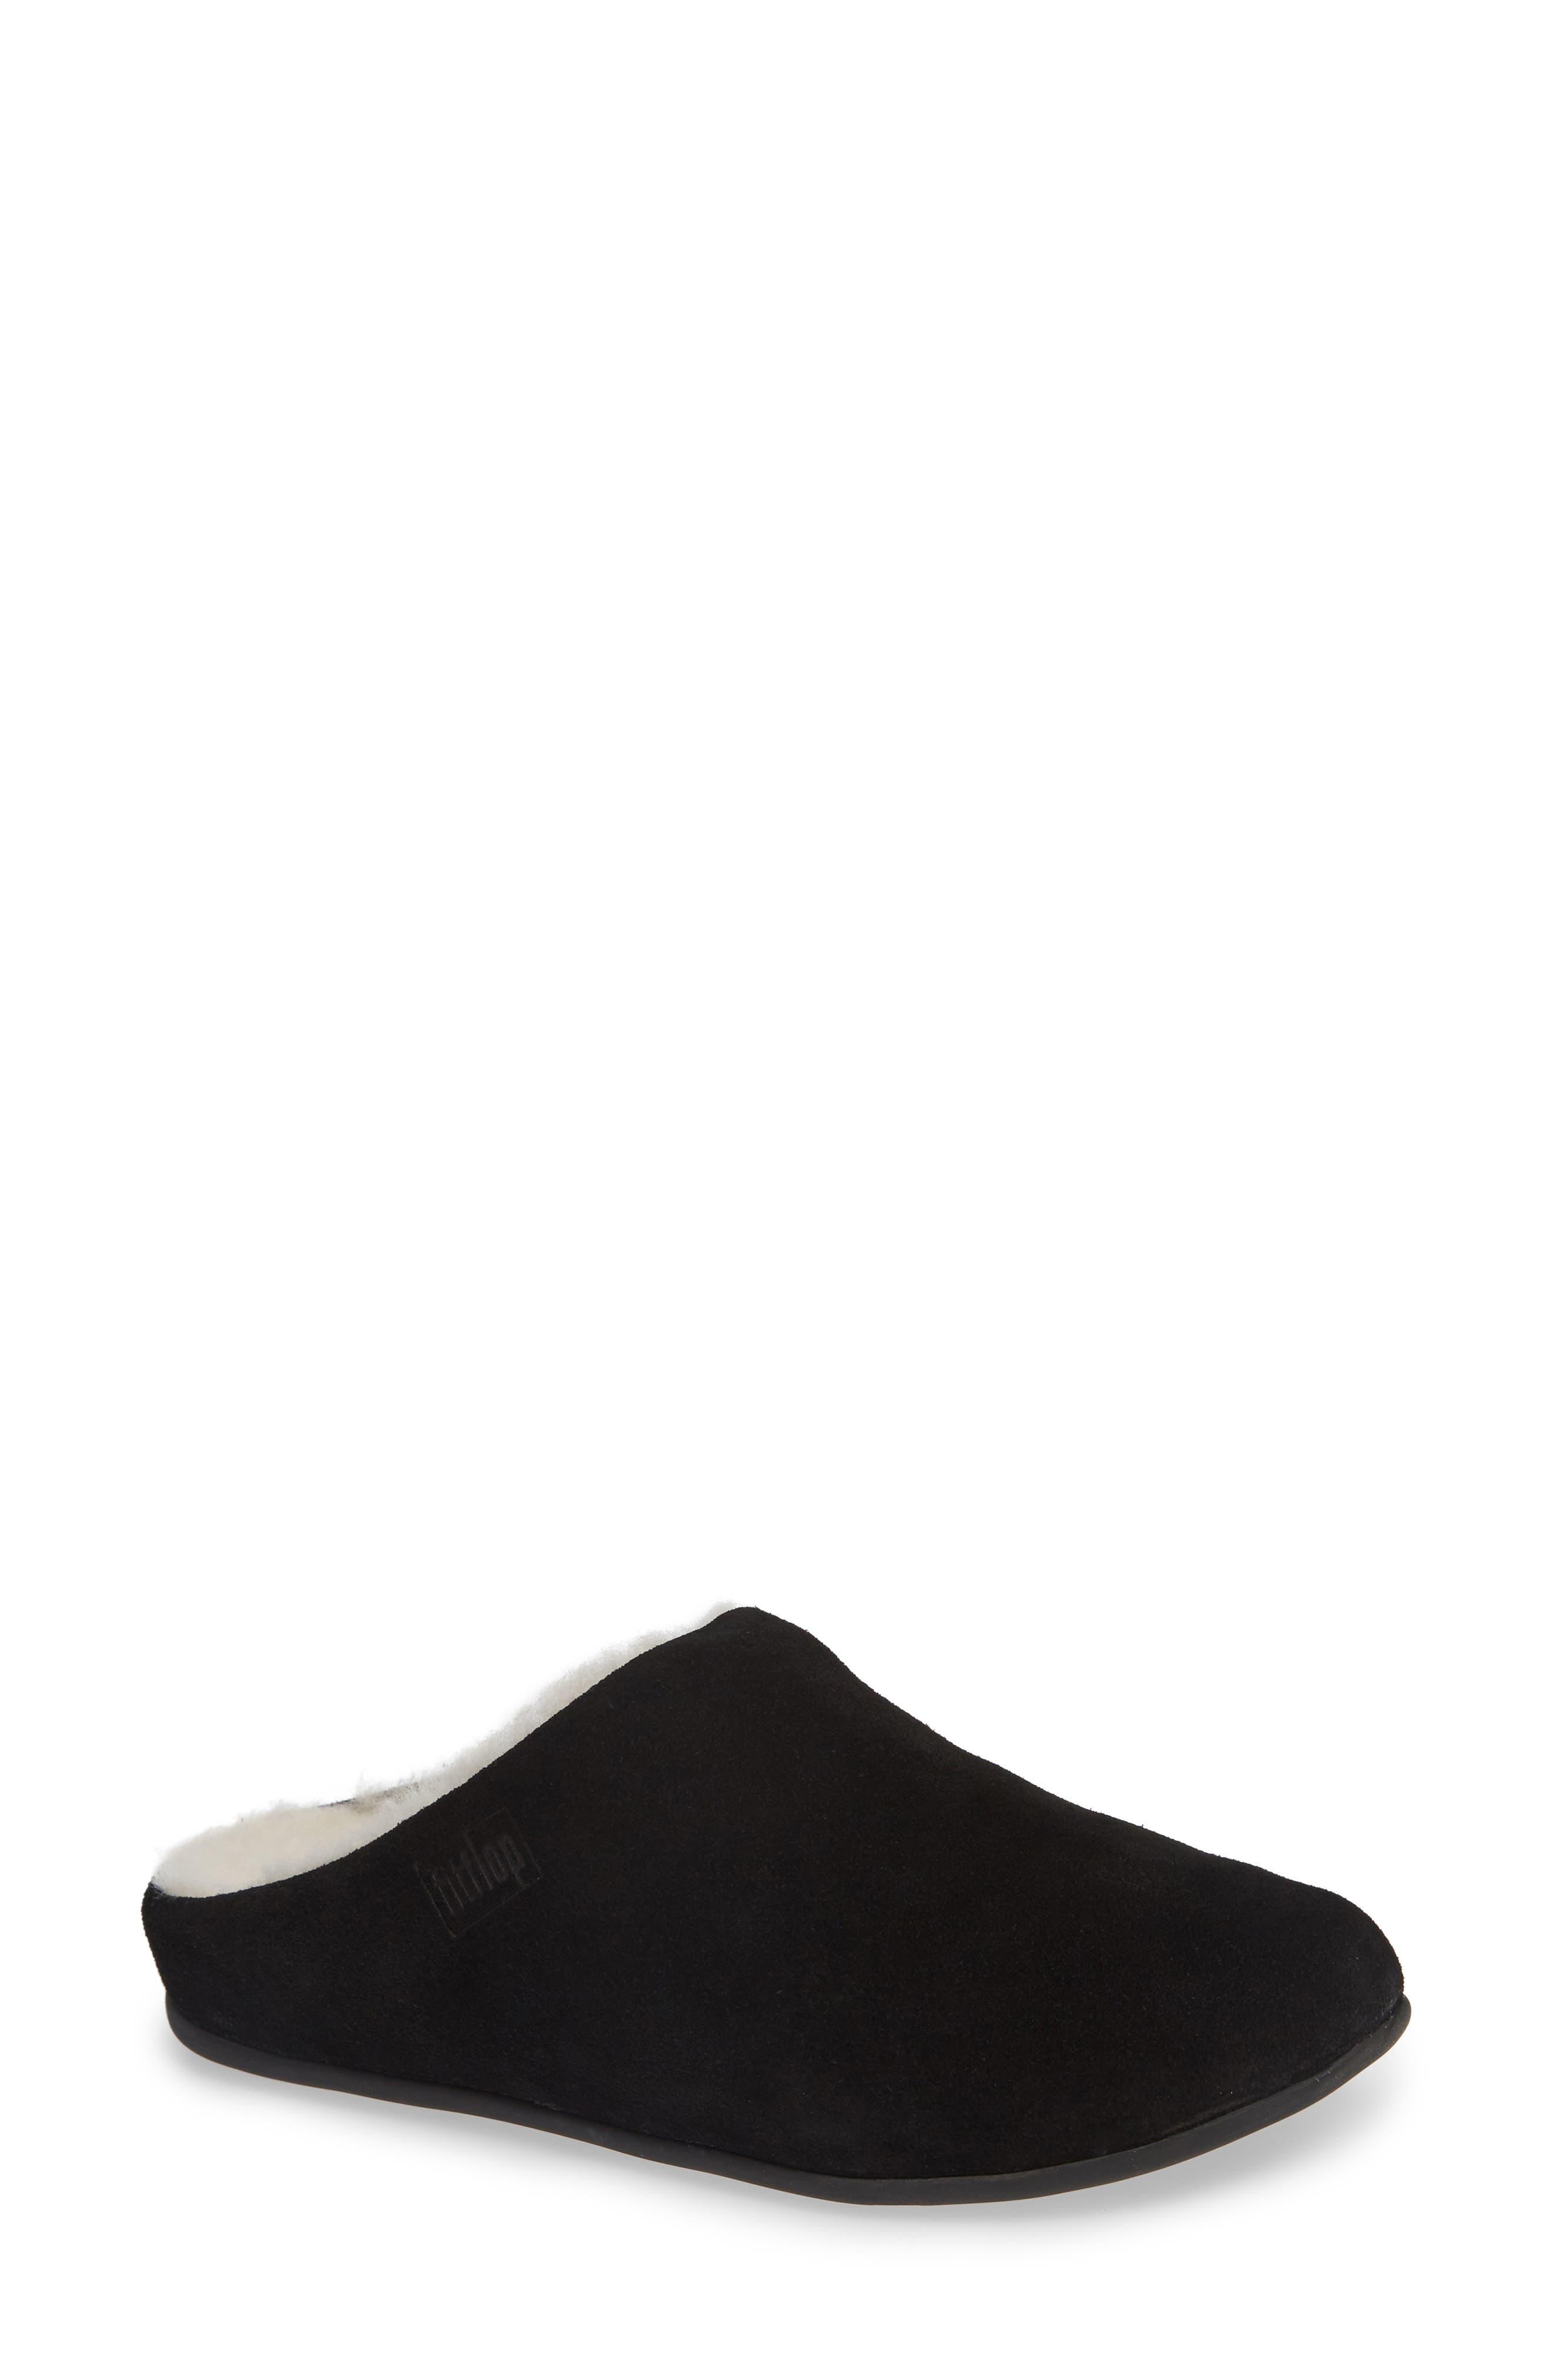 Women's FitFlop Mules \u0026 Slides | Nordstrom